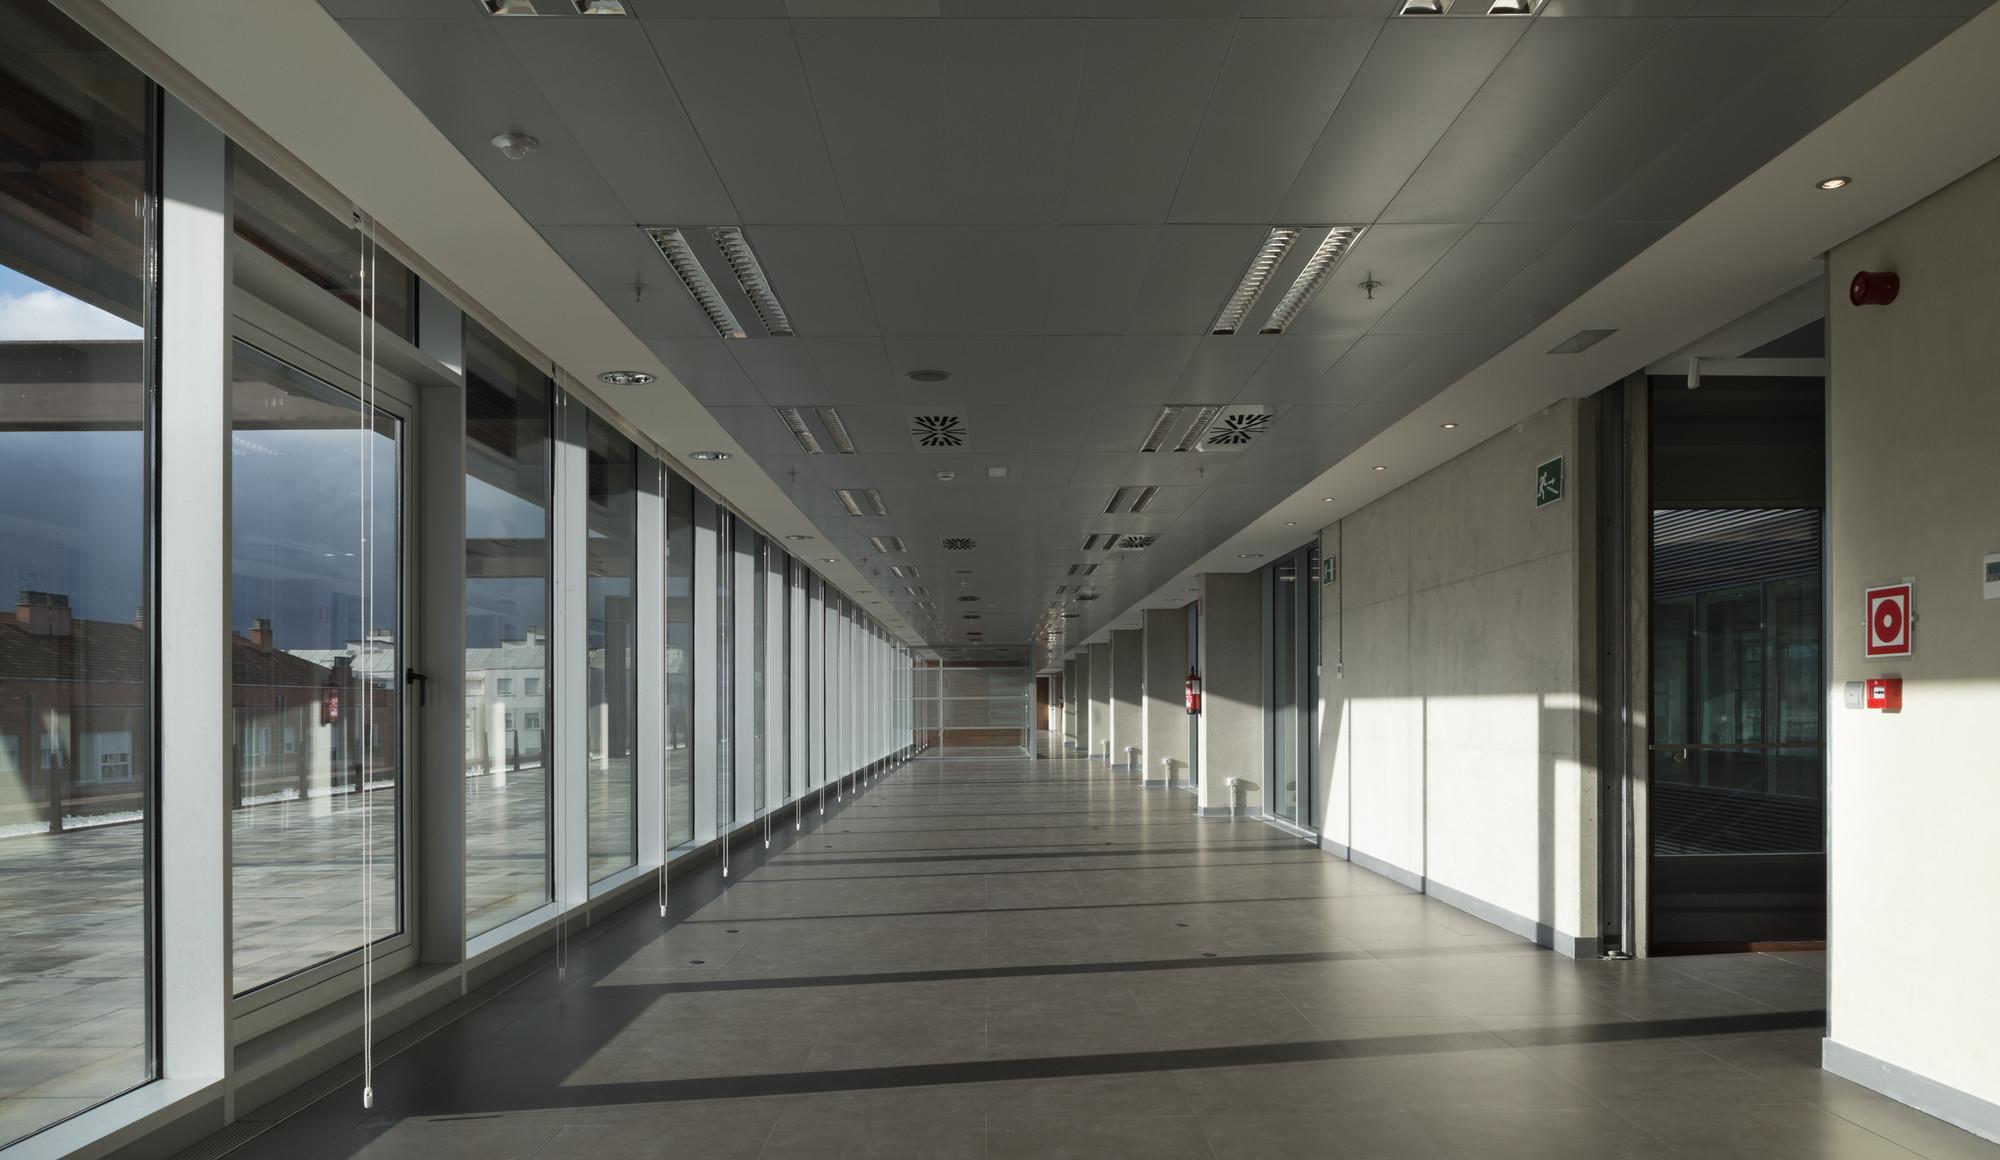 Galer a de edificio de oficinas en vitoria lh14 arquitectos 10 - Arquitectos en vitoria ...